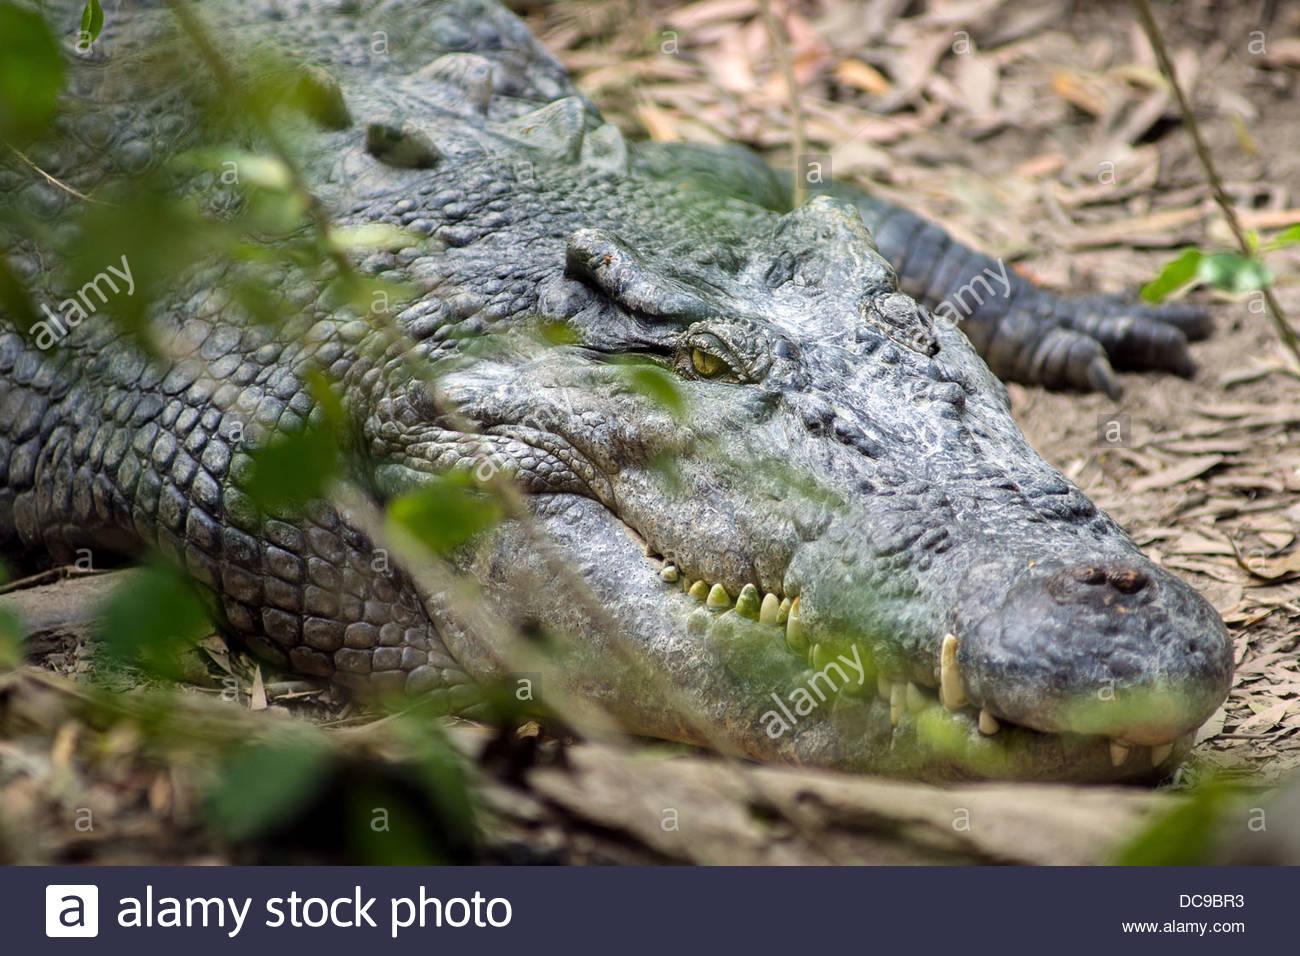 Saltwater crocodile - Crocodylus porosus - also known as saltie, estuarine or Indo-Pacific crocodile - Stock Image